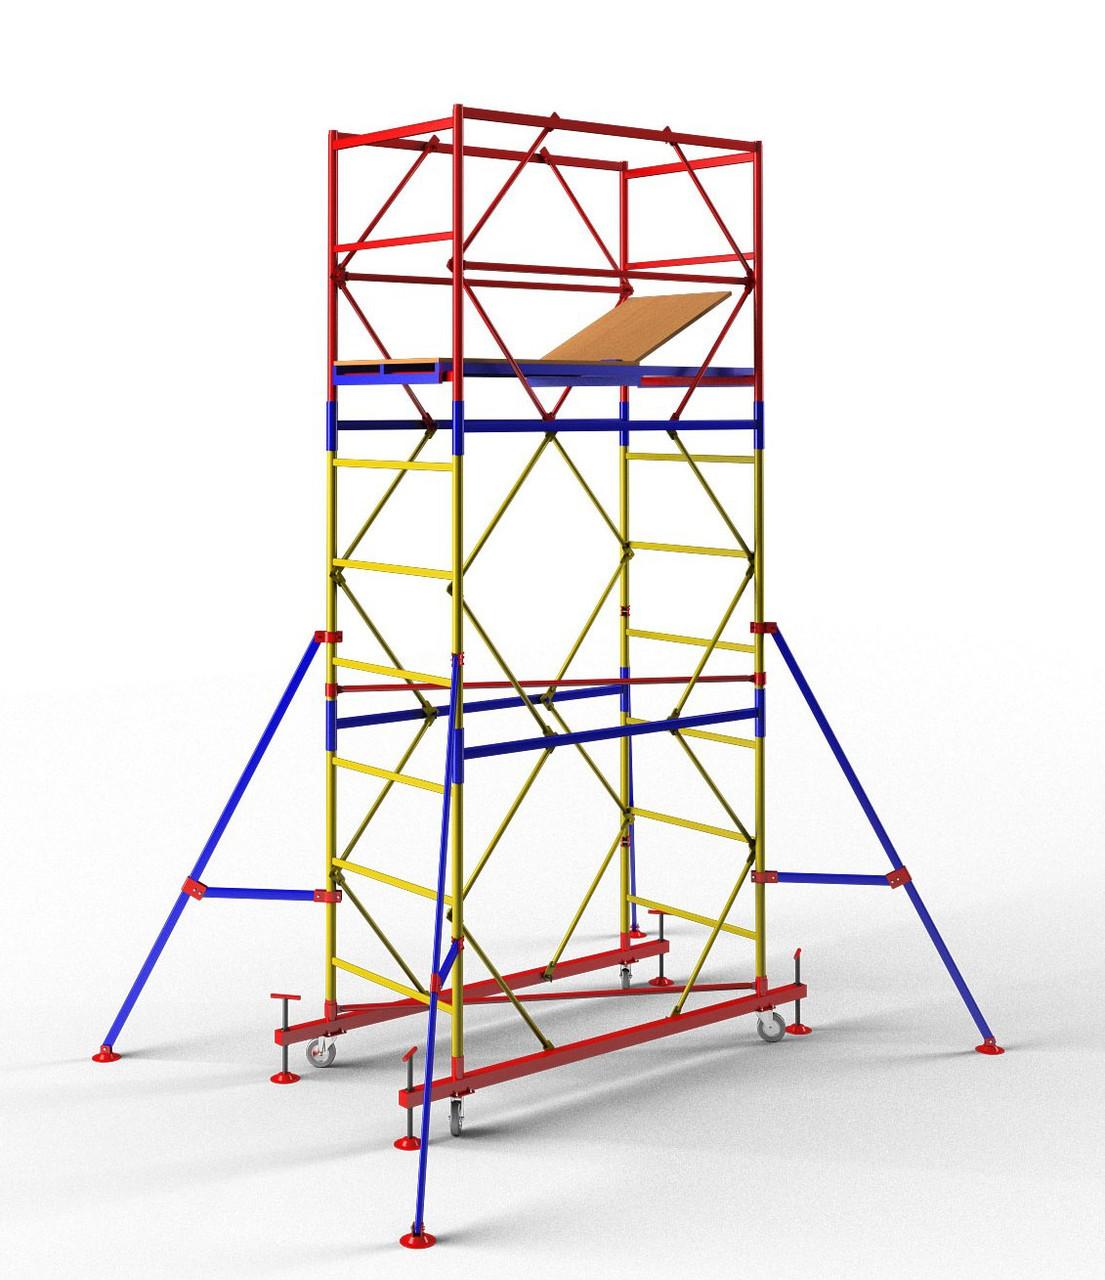 Вышка-тура мобильная облегченная 2,0 х 2,0 м (2+1) Раб.высота 5 м